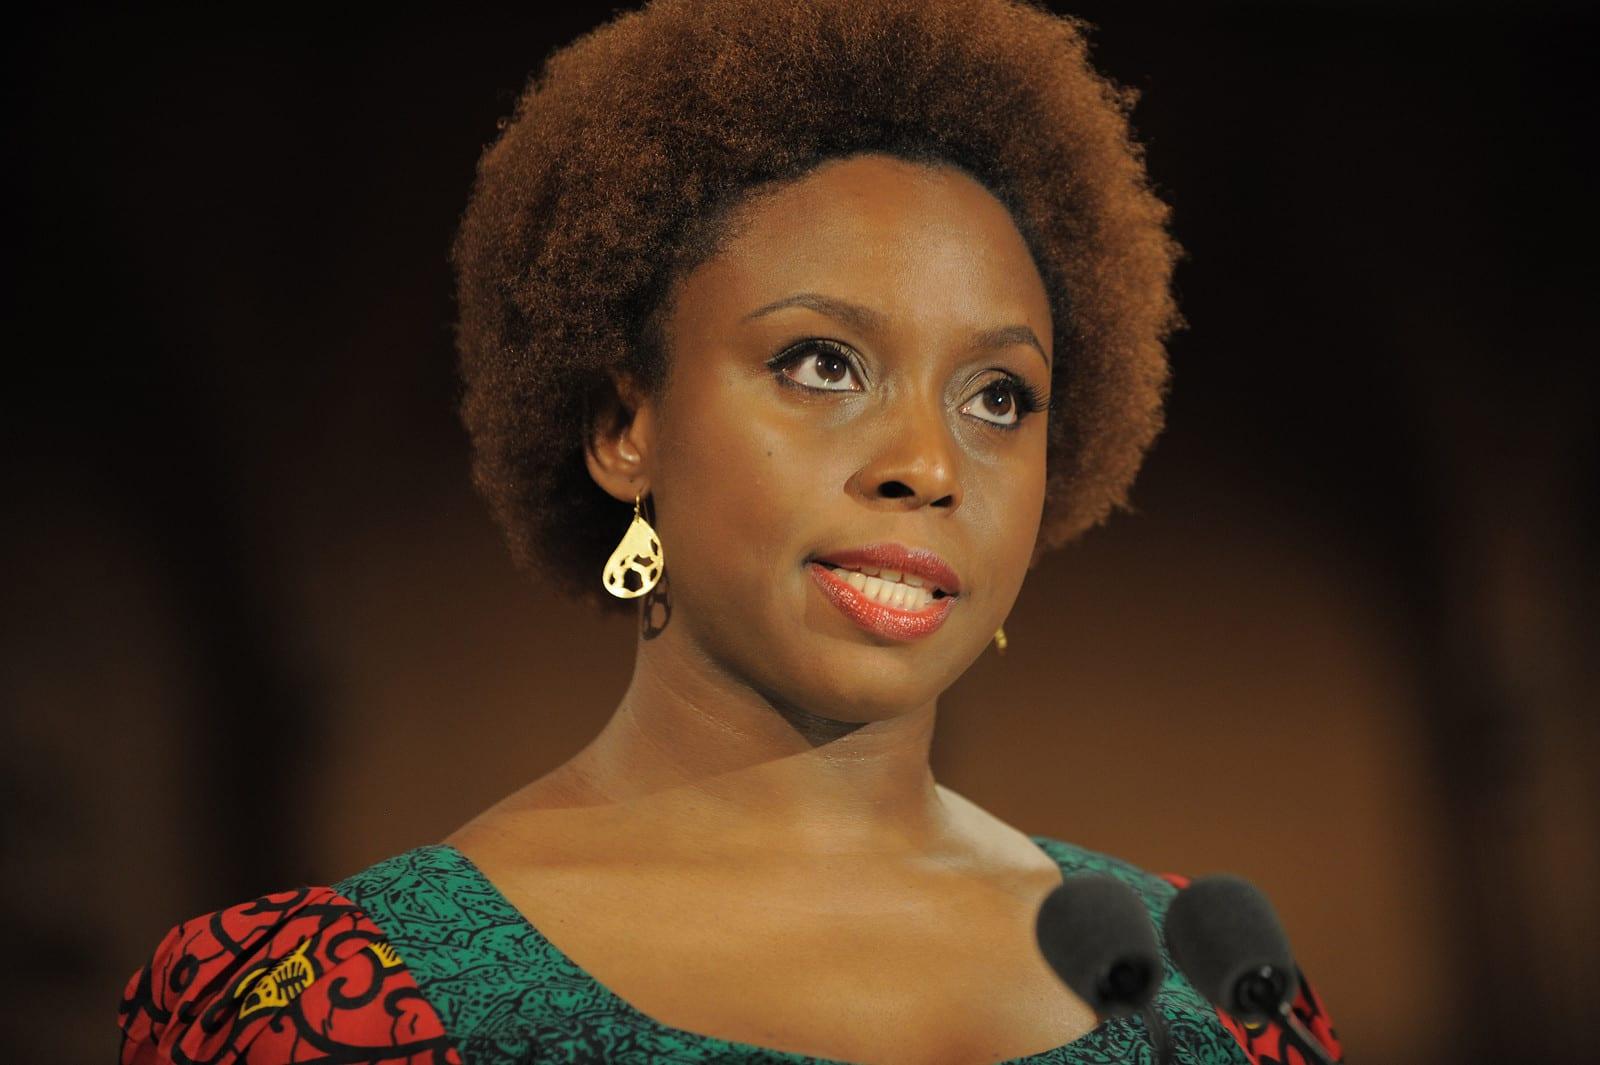 Chimamanda Ngozi Adichie at the 2012 Commonwealth Lecture